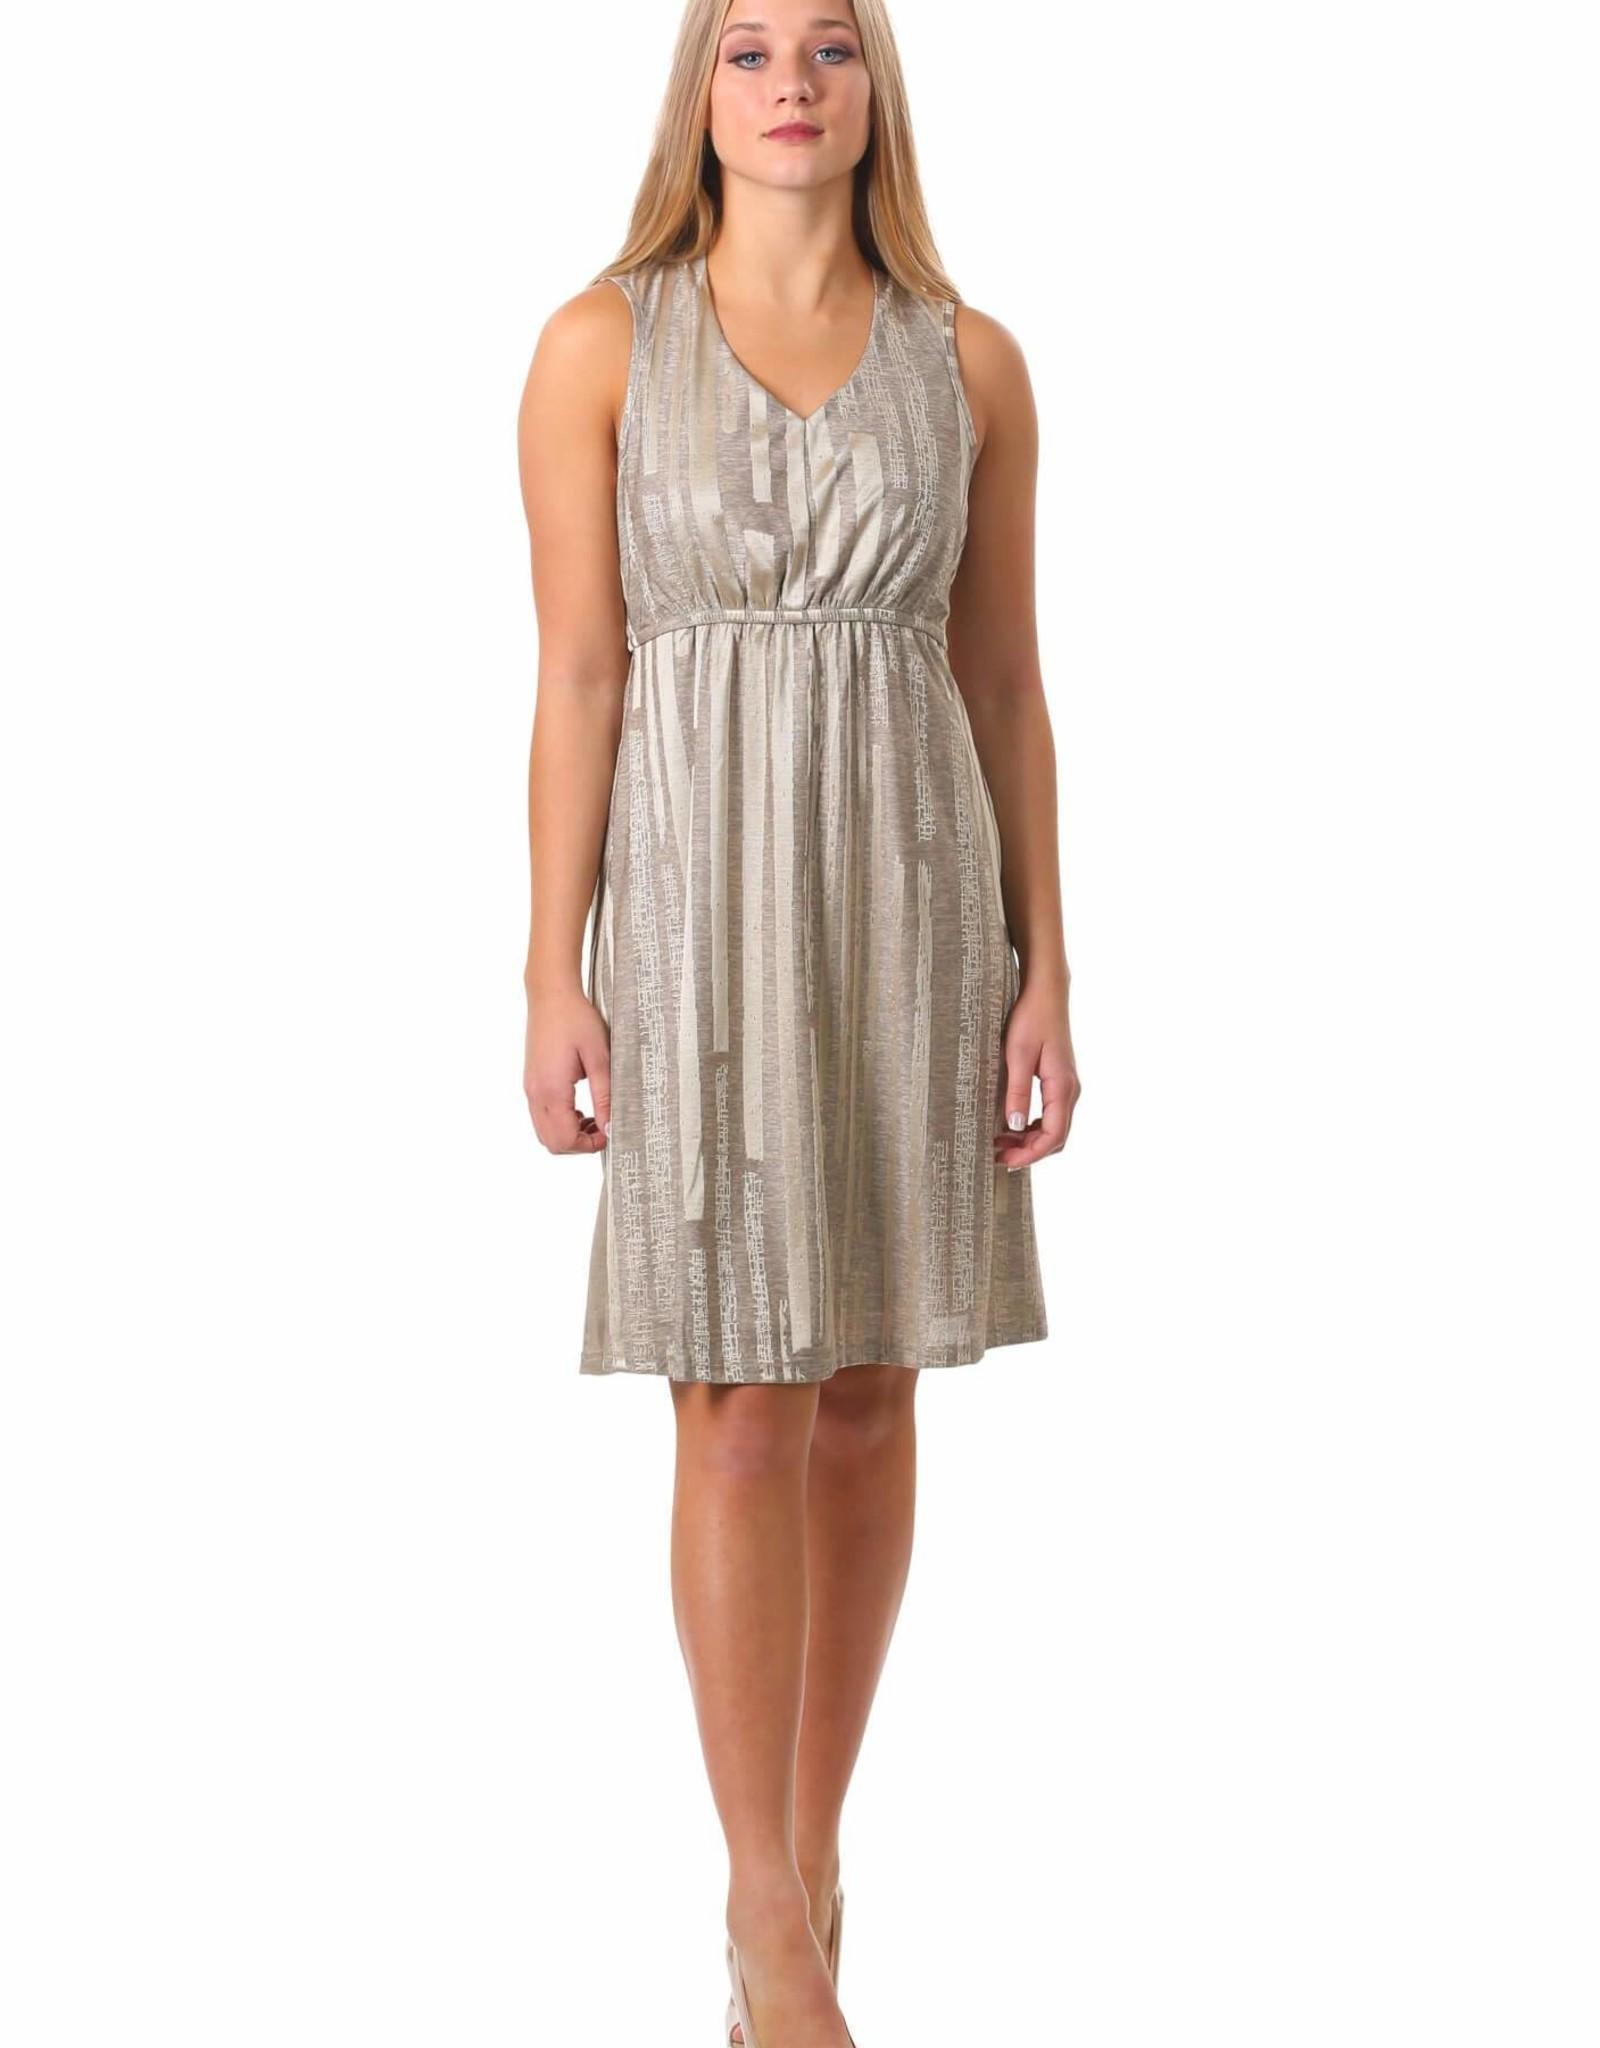 - Gold Metallic V-Neck Tank Dress